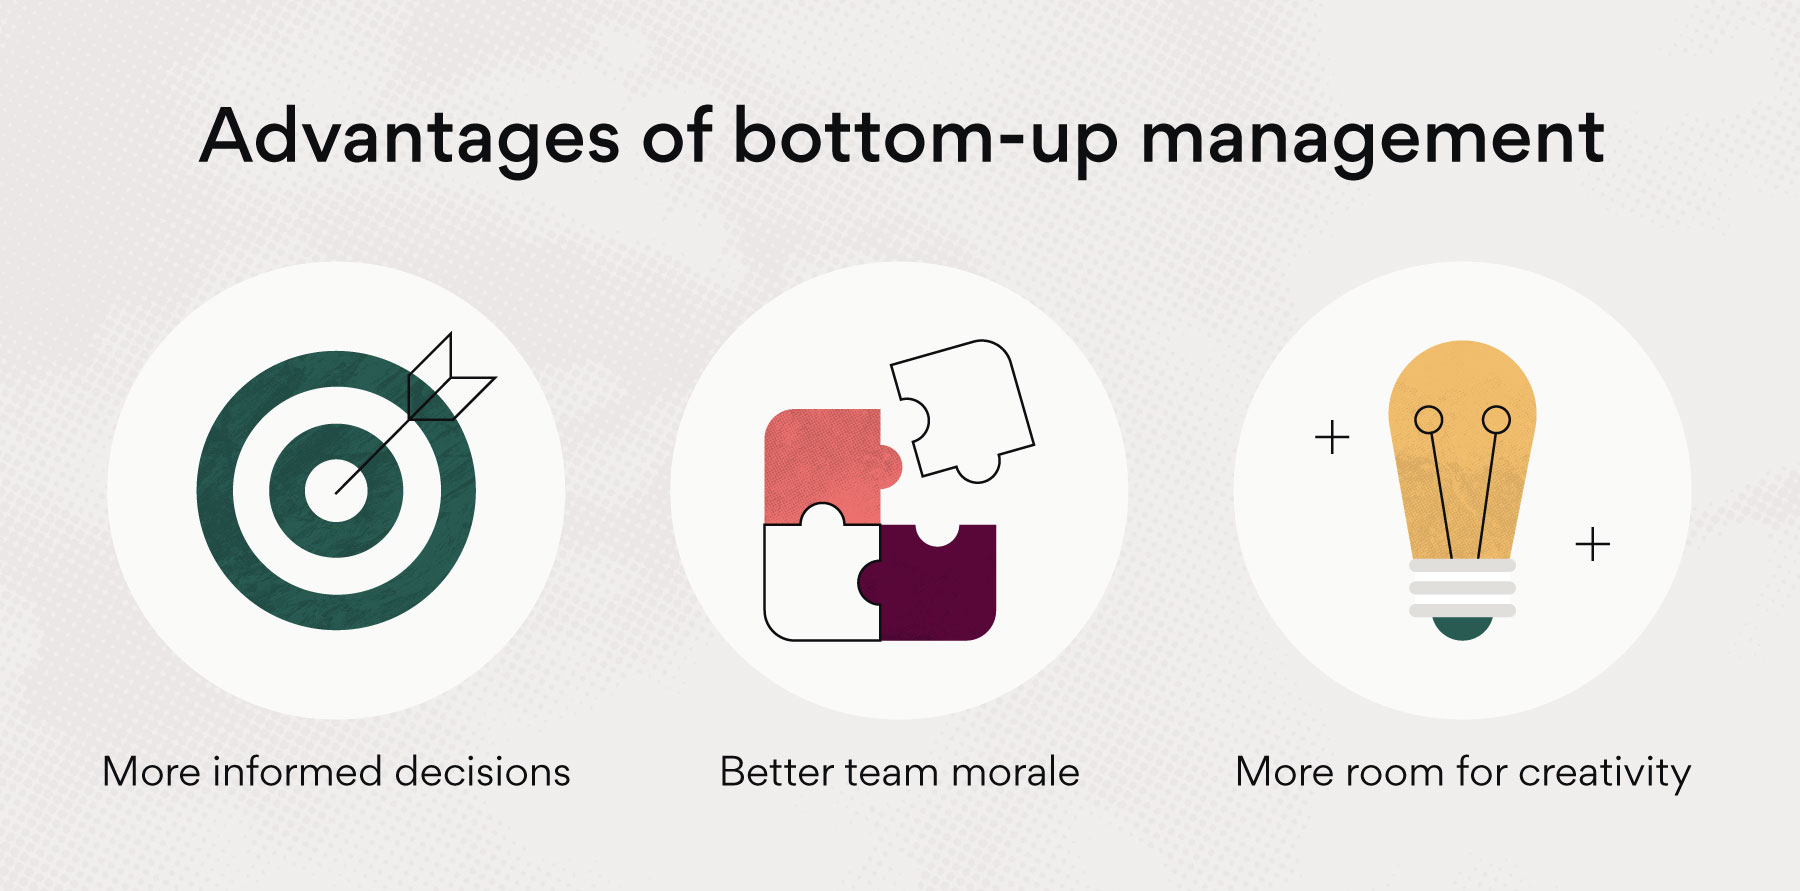 Advantages of bottom-up management